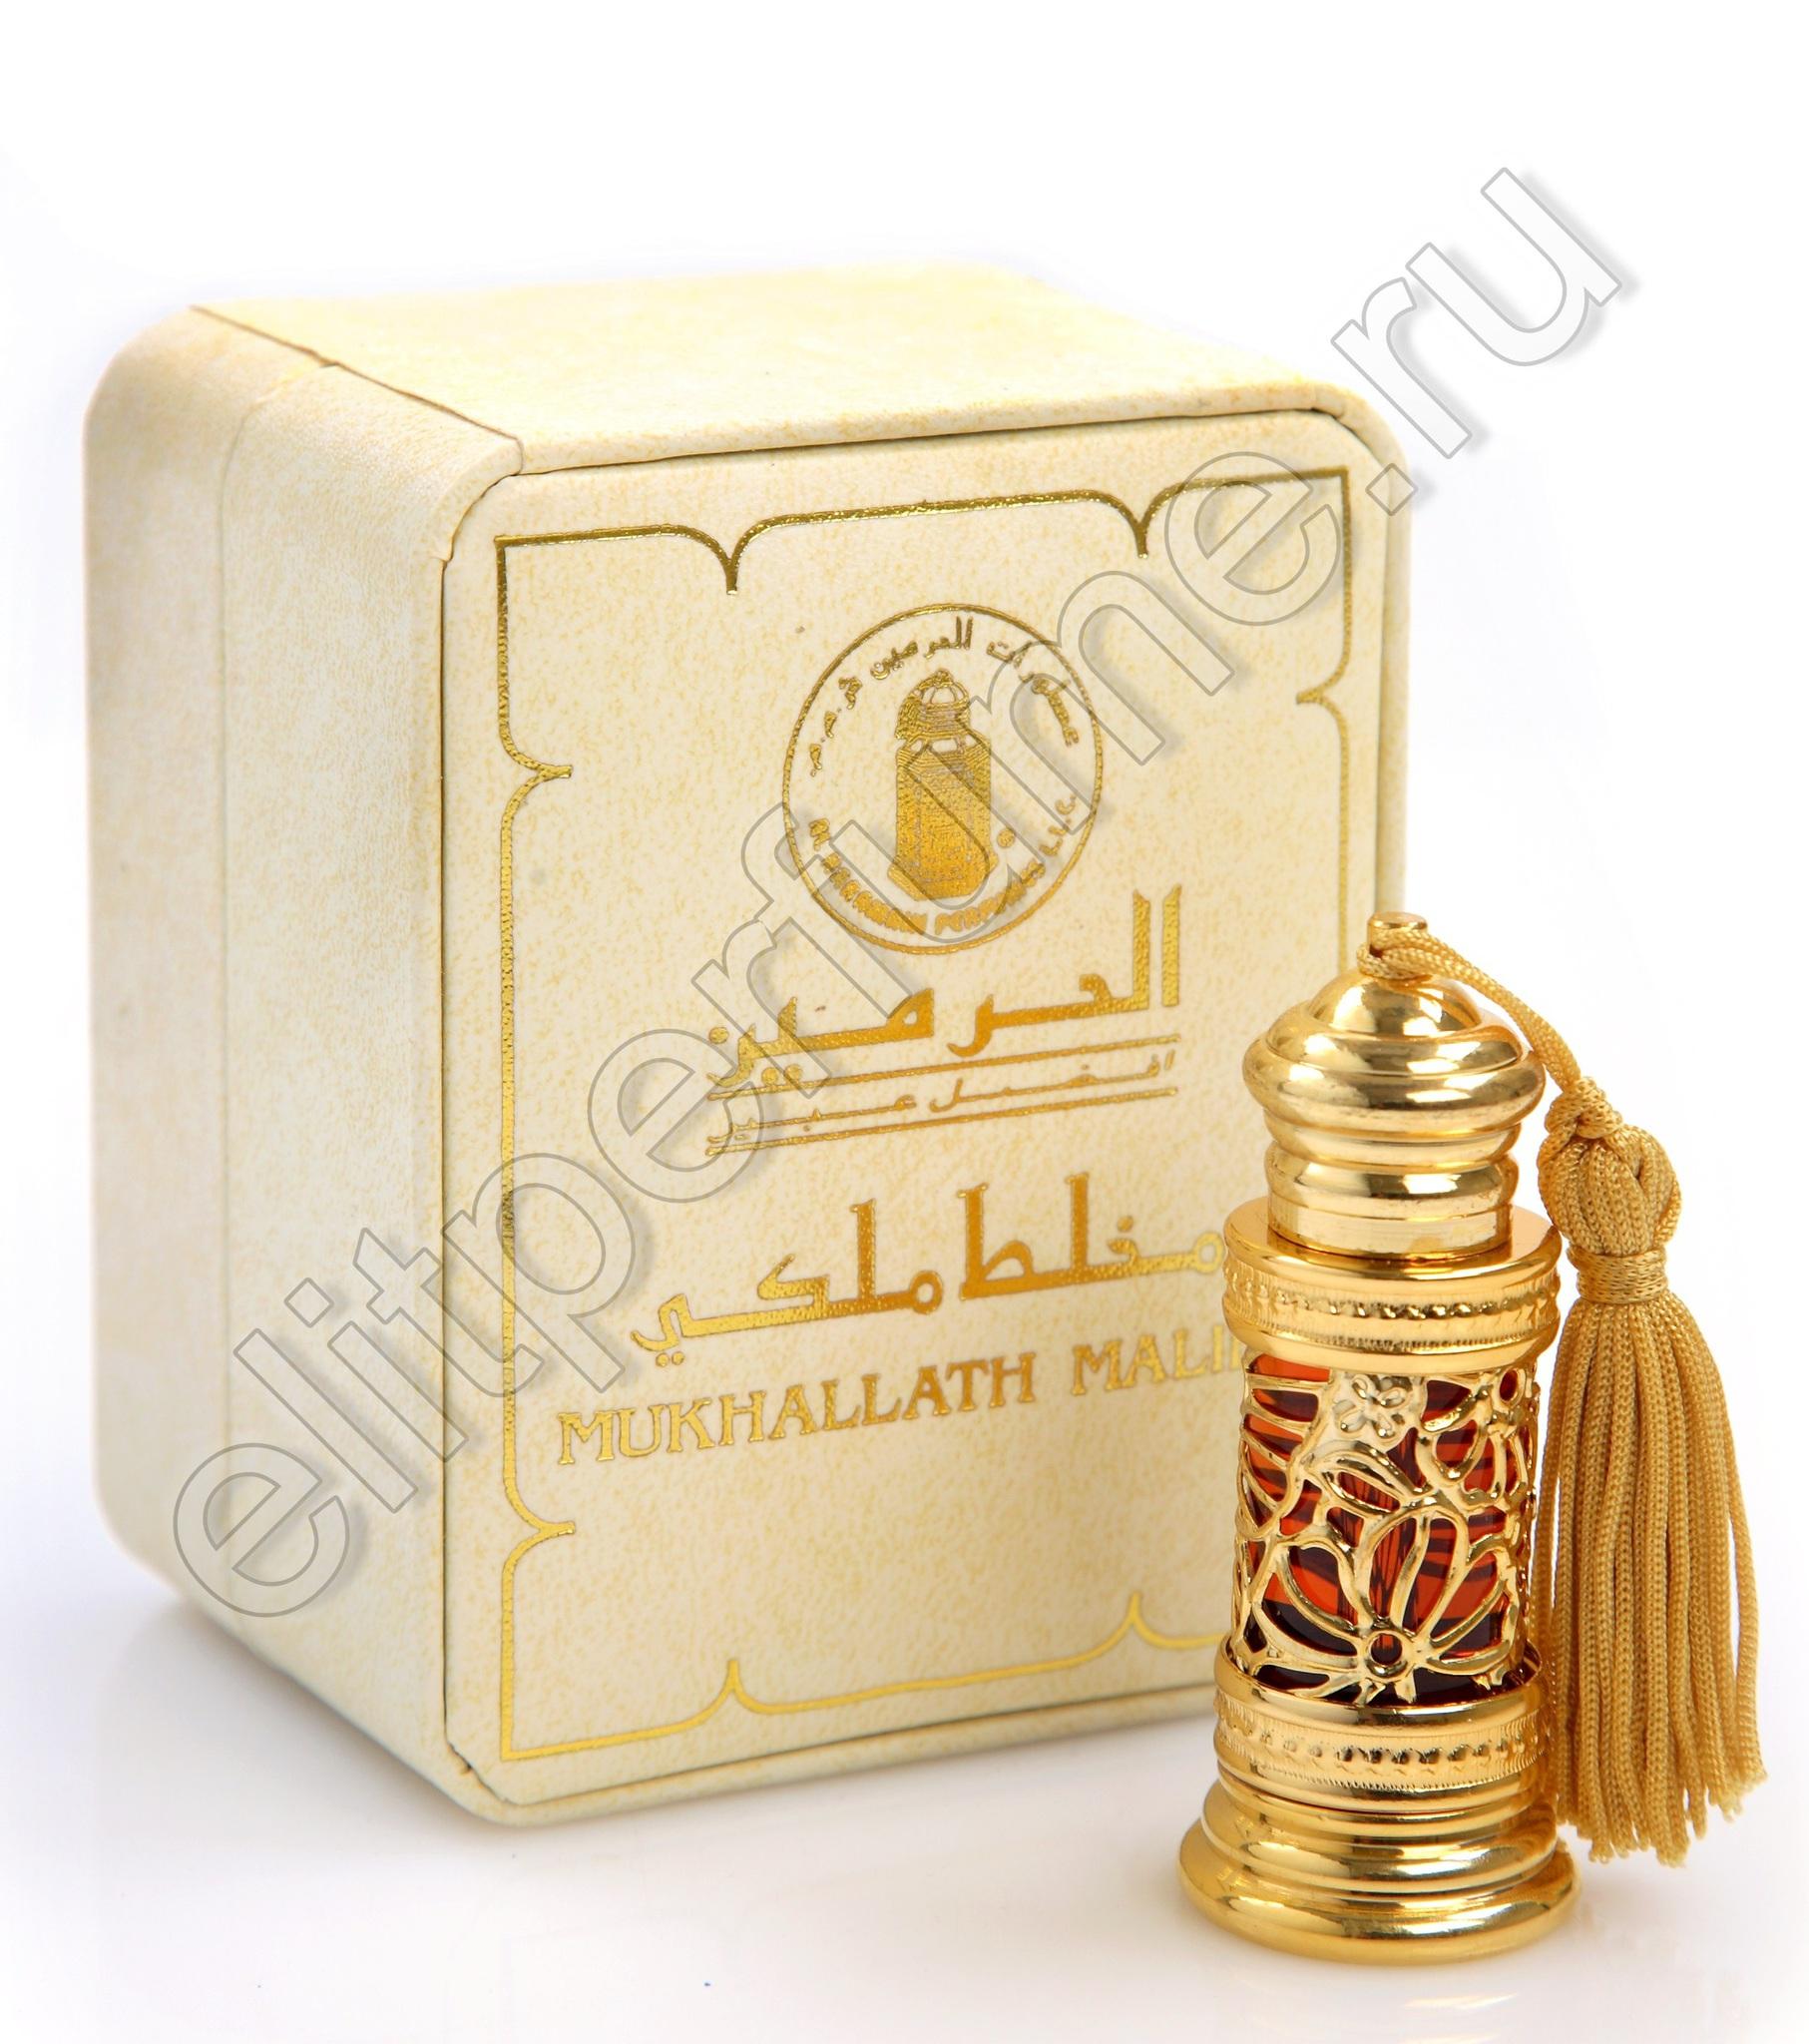 Мухаллат Малики Mukhallath Maliki 10 мл арабские масляные духи от Аль Харамайн Al Haramain Perfumes